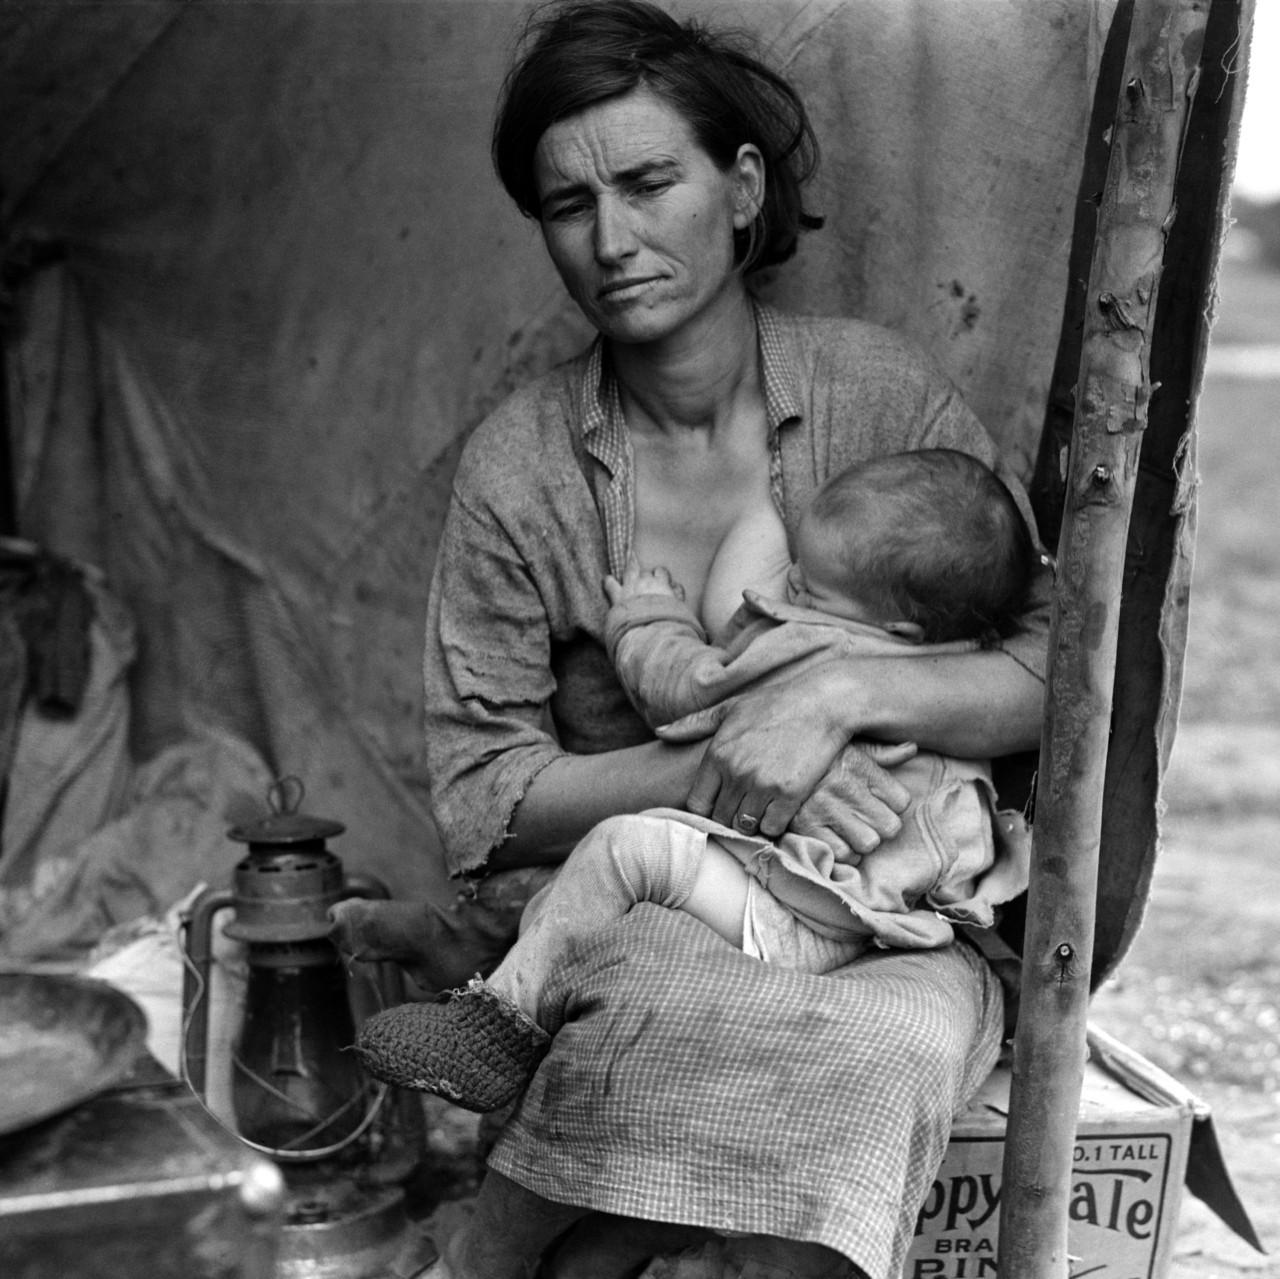 Madre emigrante a California, posiblemente la imagen del drama de la crisis americana.